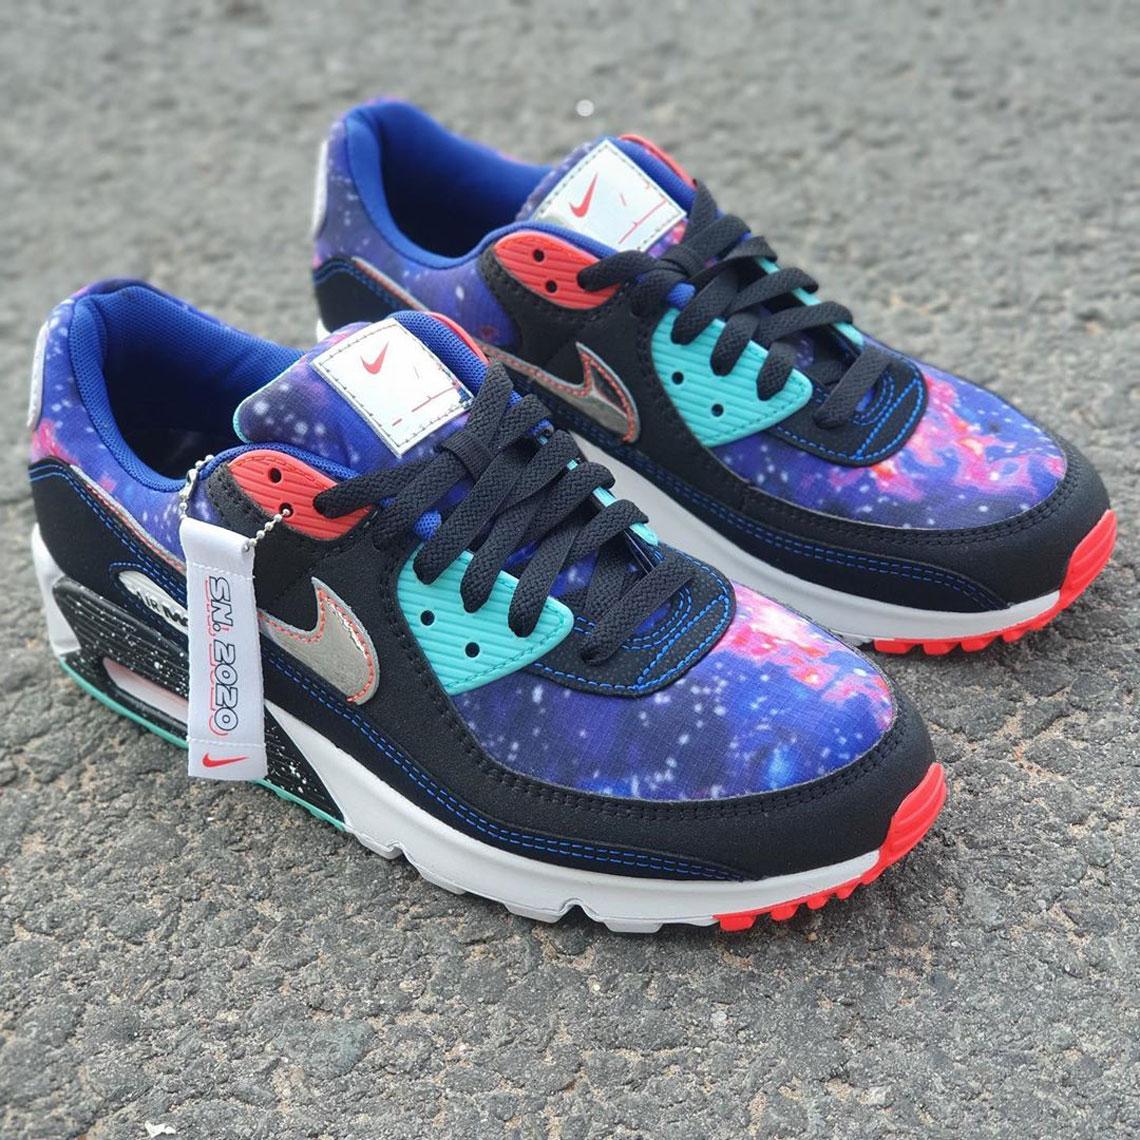 nike galaxy shoes price